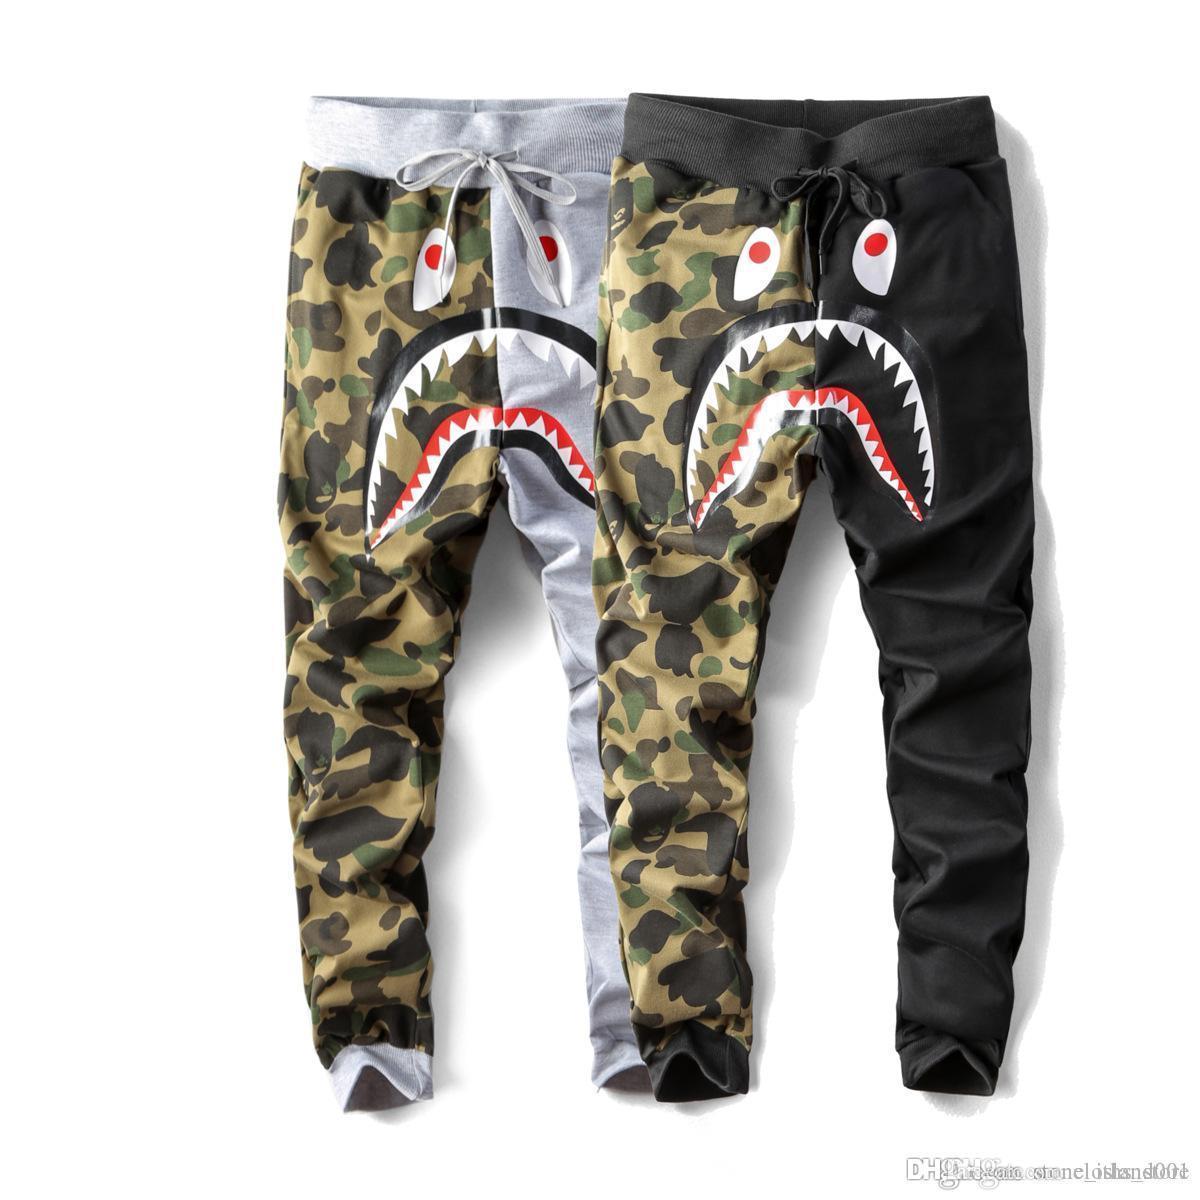 APE Bape Pants Shark Head Camo Trousers Beam Leisure Pants Sports Sweatpants